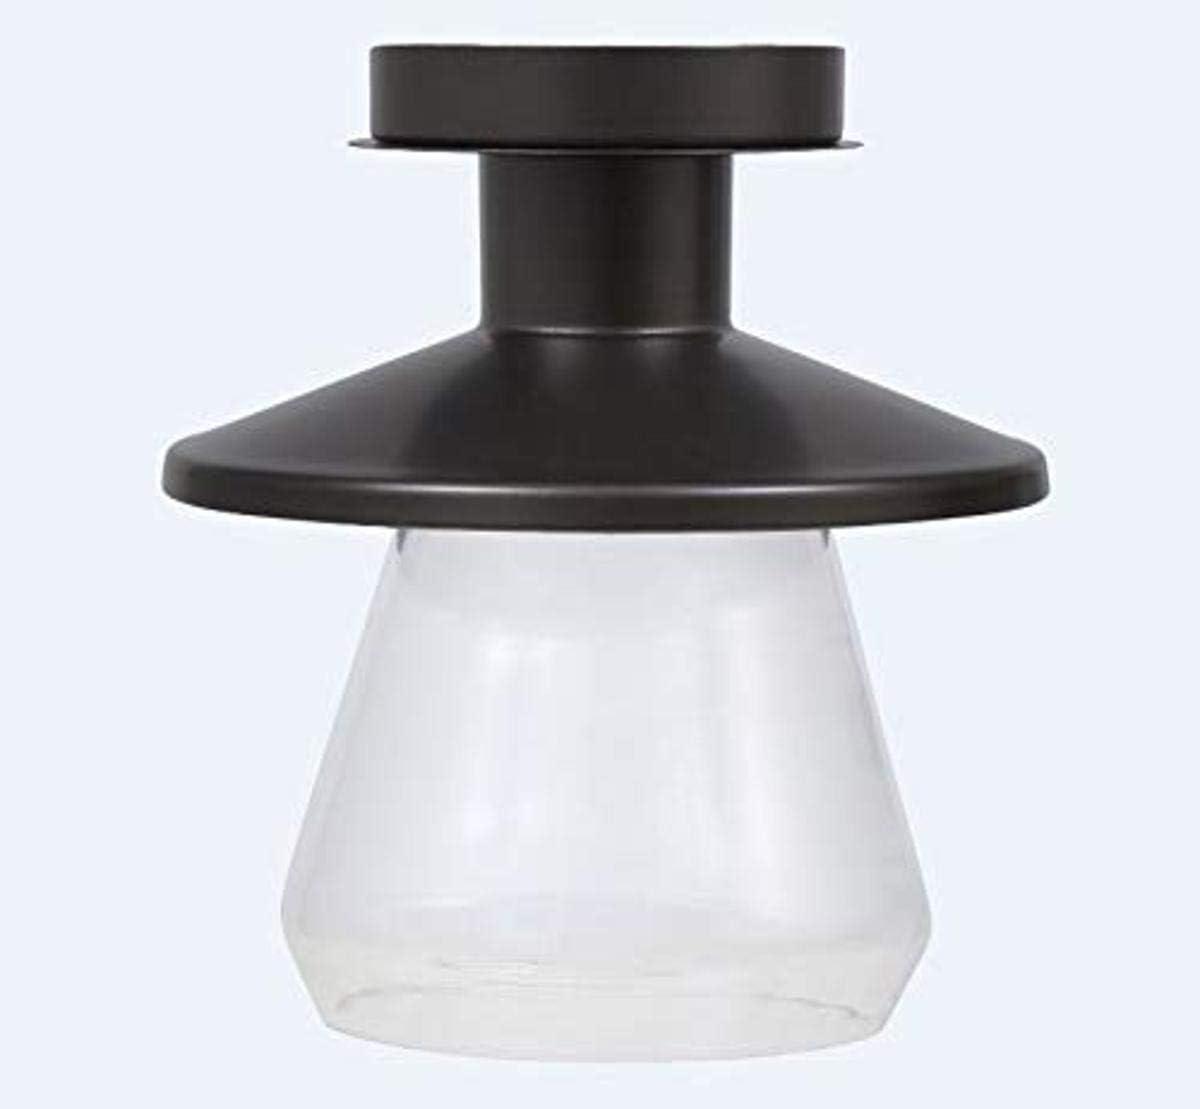 SYLVANIA General Lighting Sylvania Vintage Fixture, Bulb Included, Antique Black 60059 Lincoln Barn Lantern Light, LED, Semi-Flush Mount, Dimmable